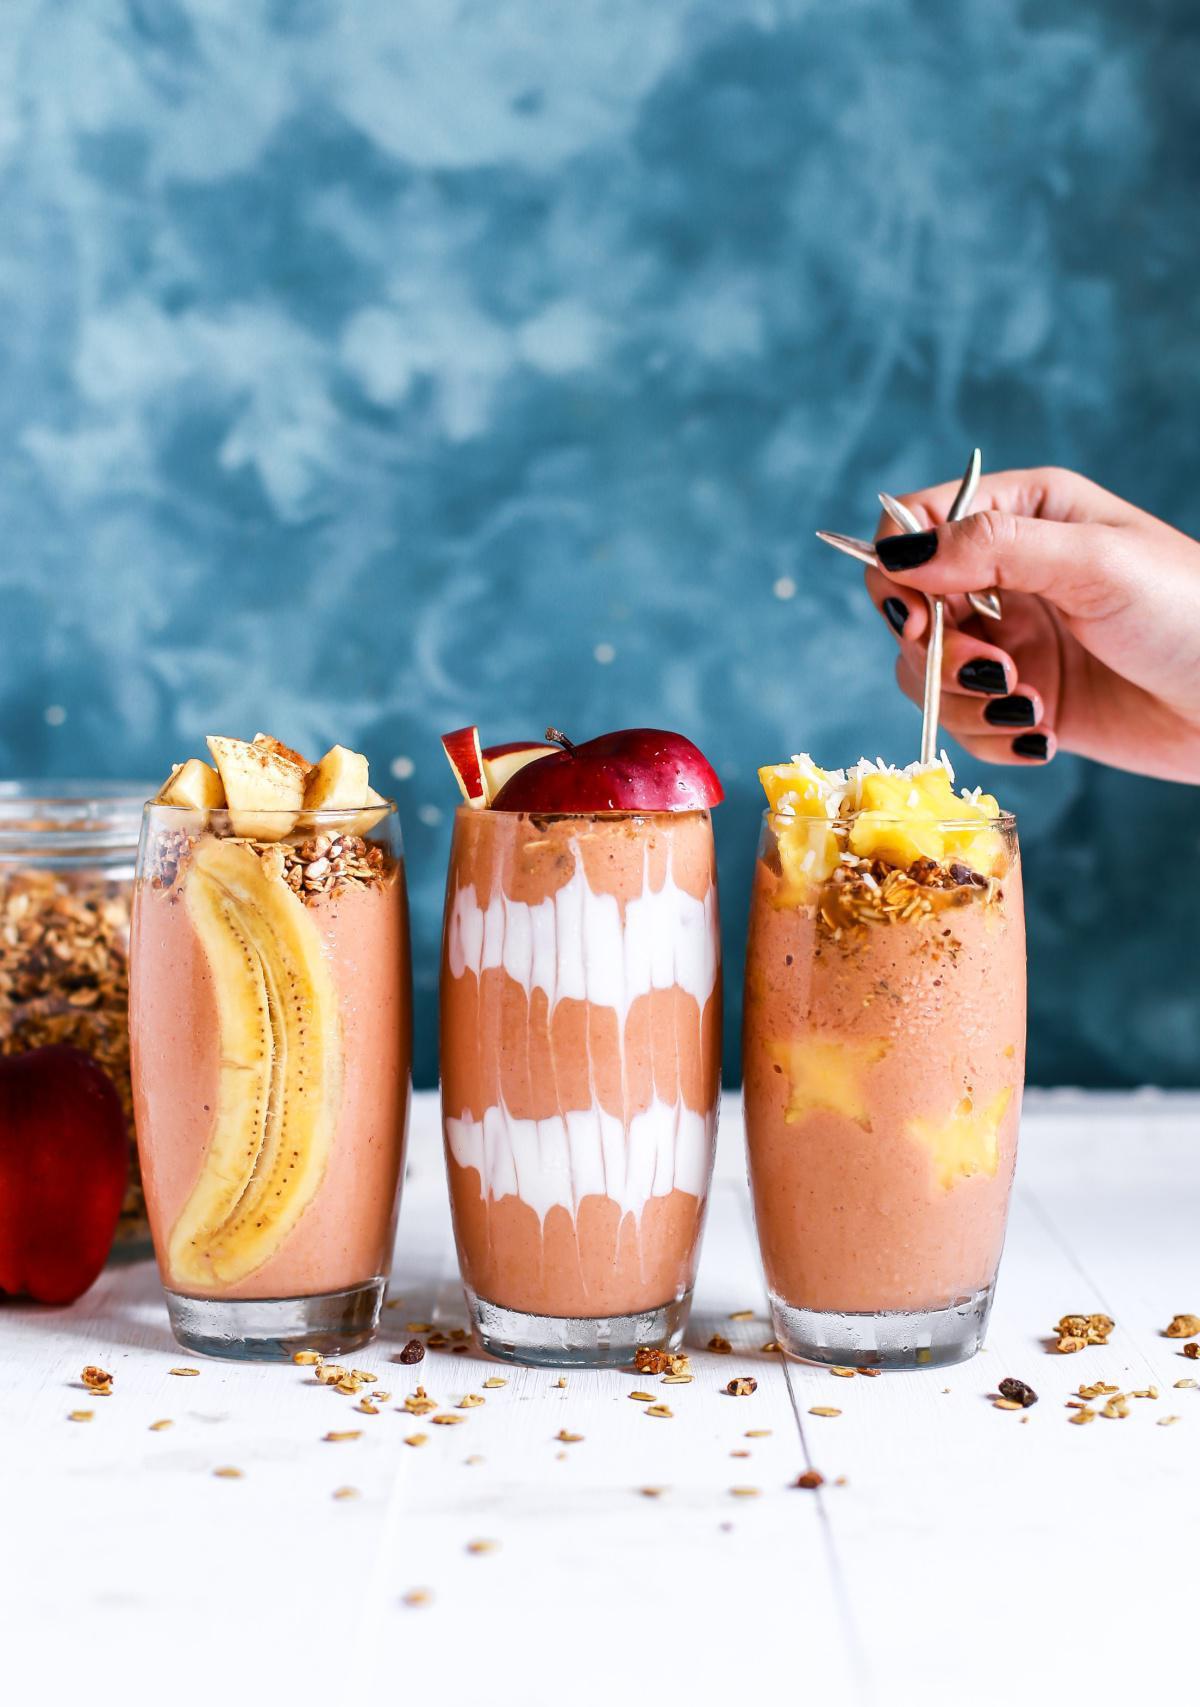 Commandez vos smoothies repas